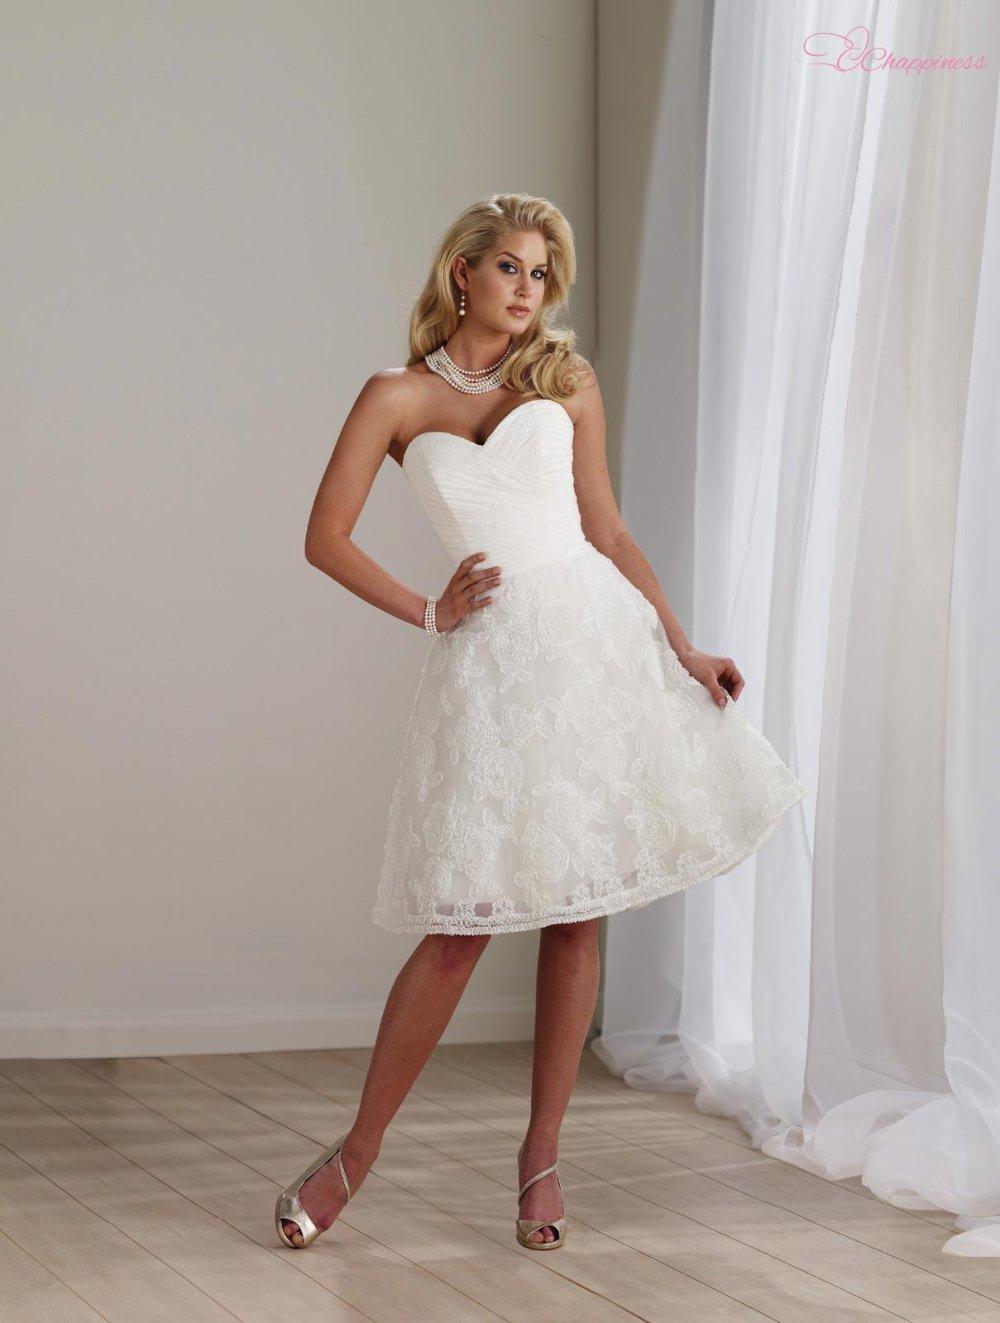 Short Ivory Wedding Dresses - Cocktail Dresses 2016